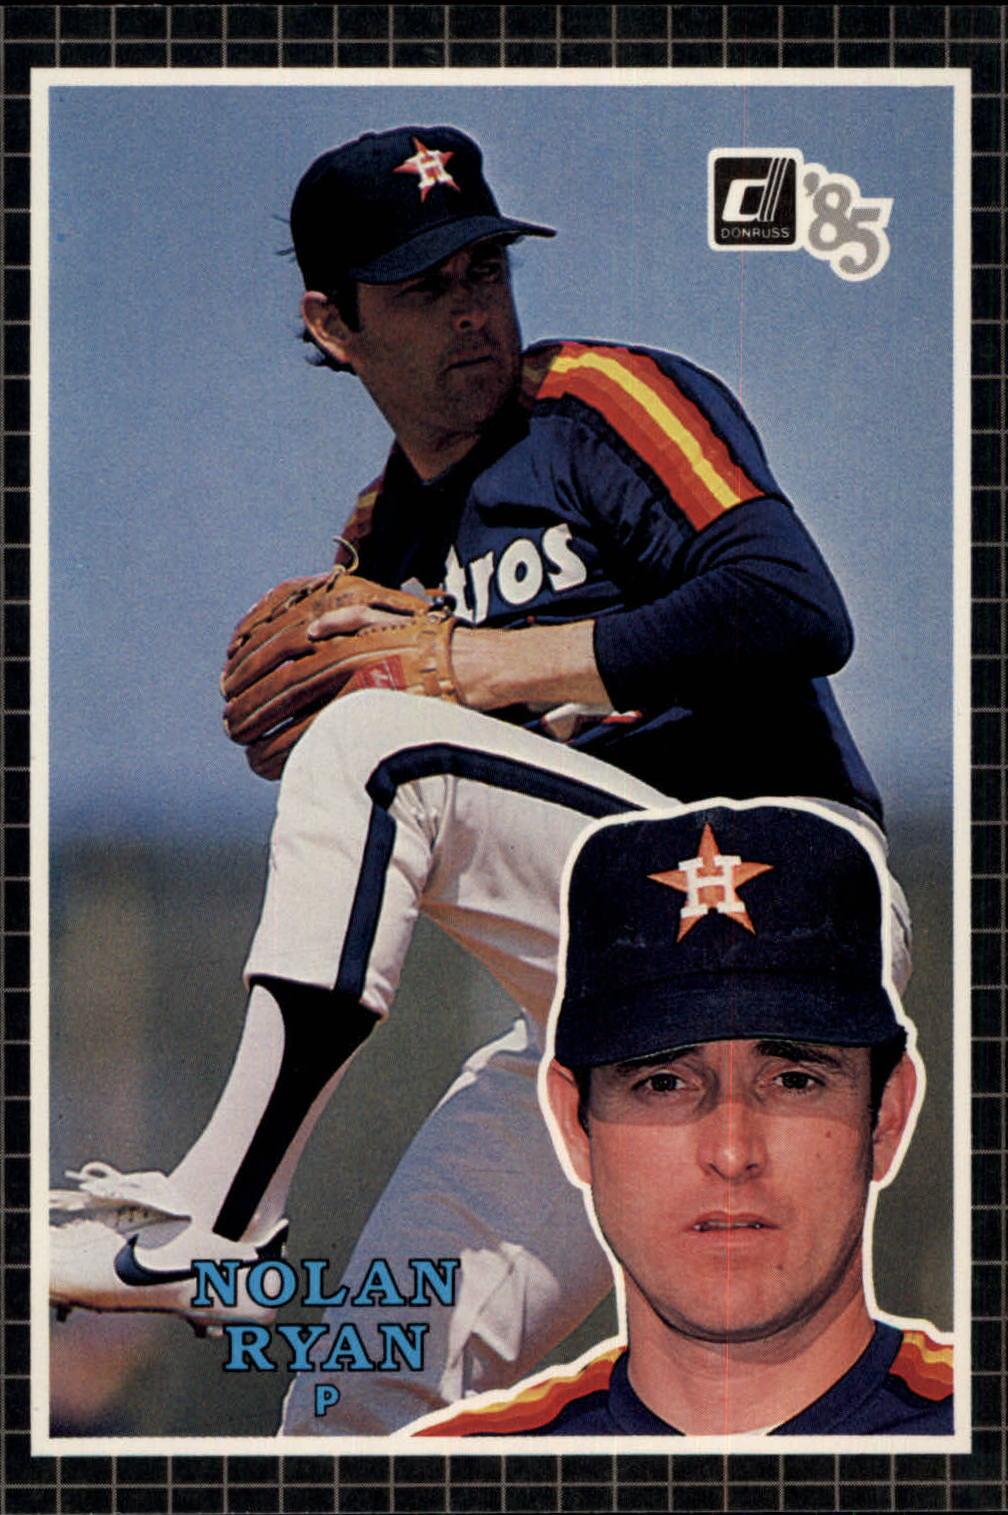 1985 Donruss Action All-Stars #20 Nolan Ryan